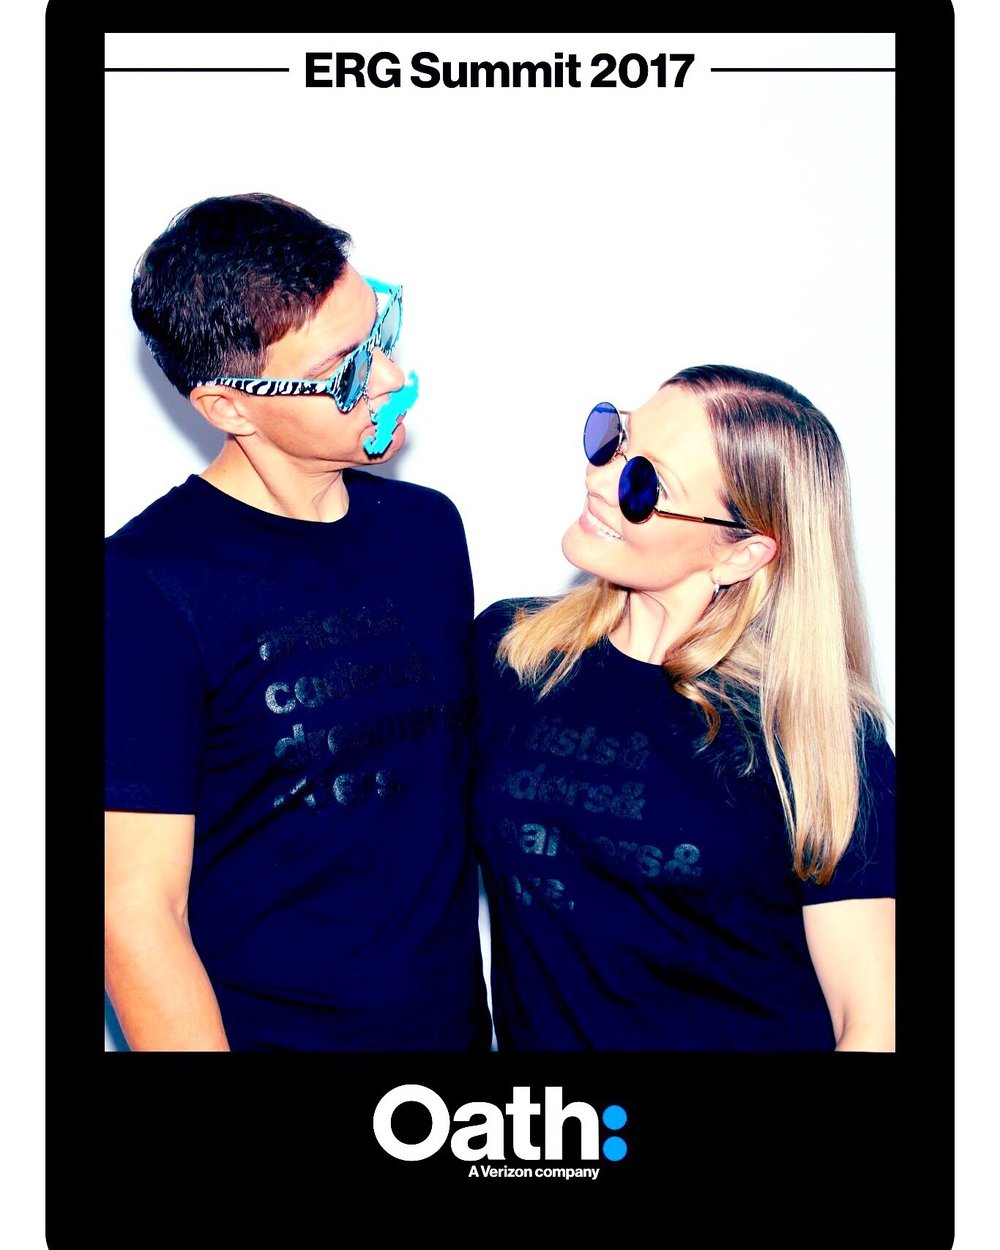 Los Gatos DJ owners Cassie & Dan Dresti - OATH event 2017.jpg